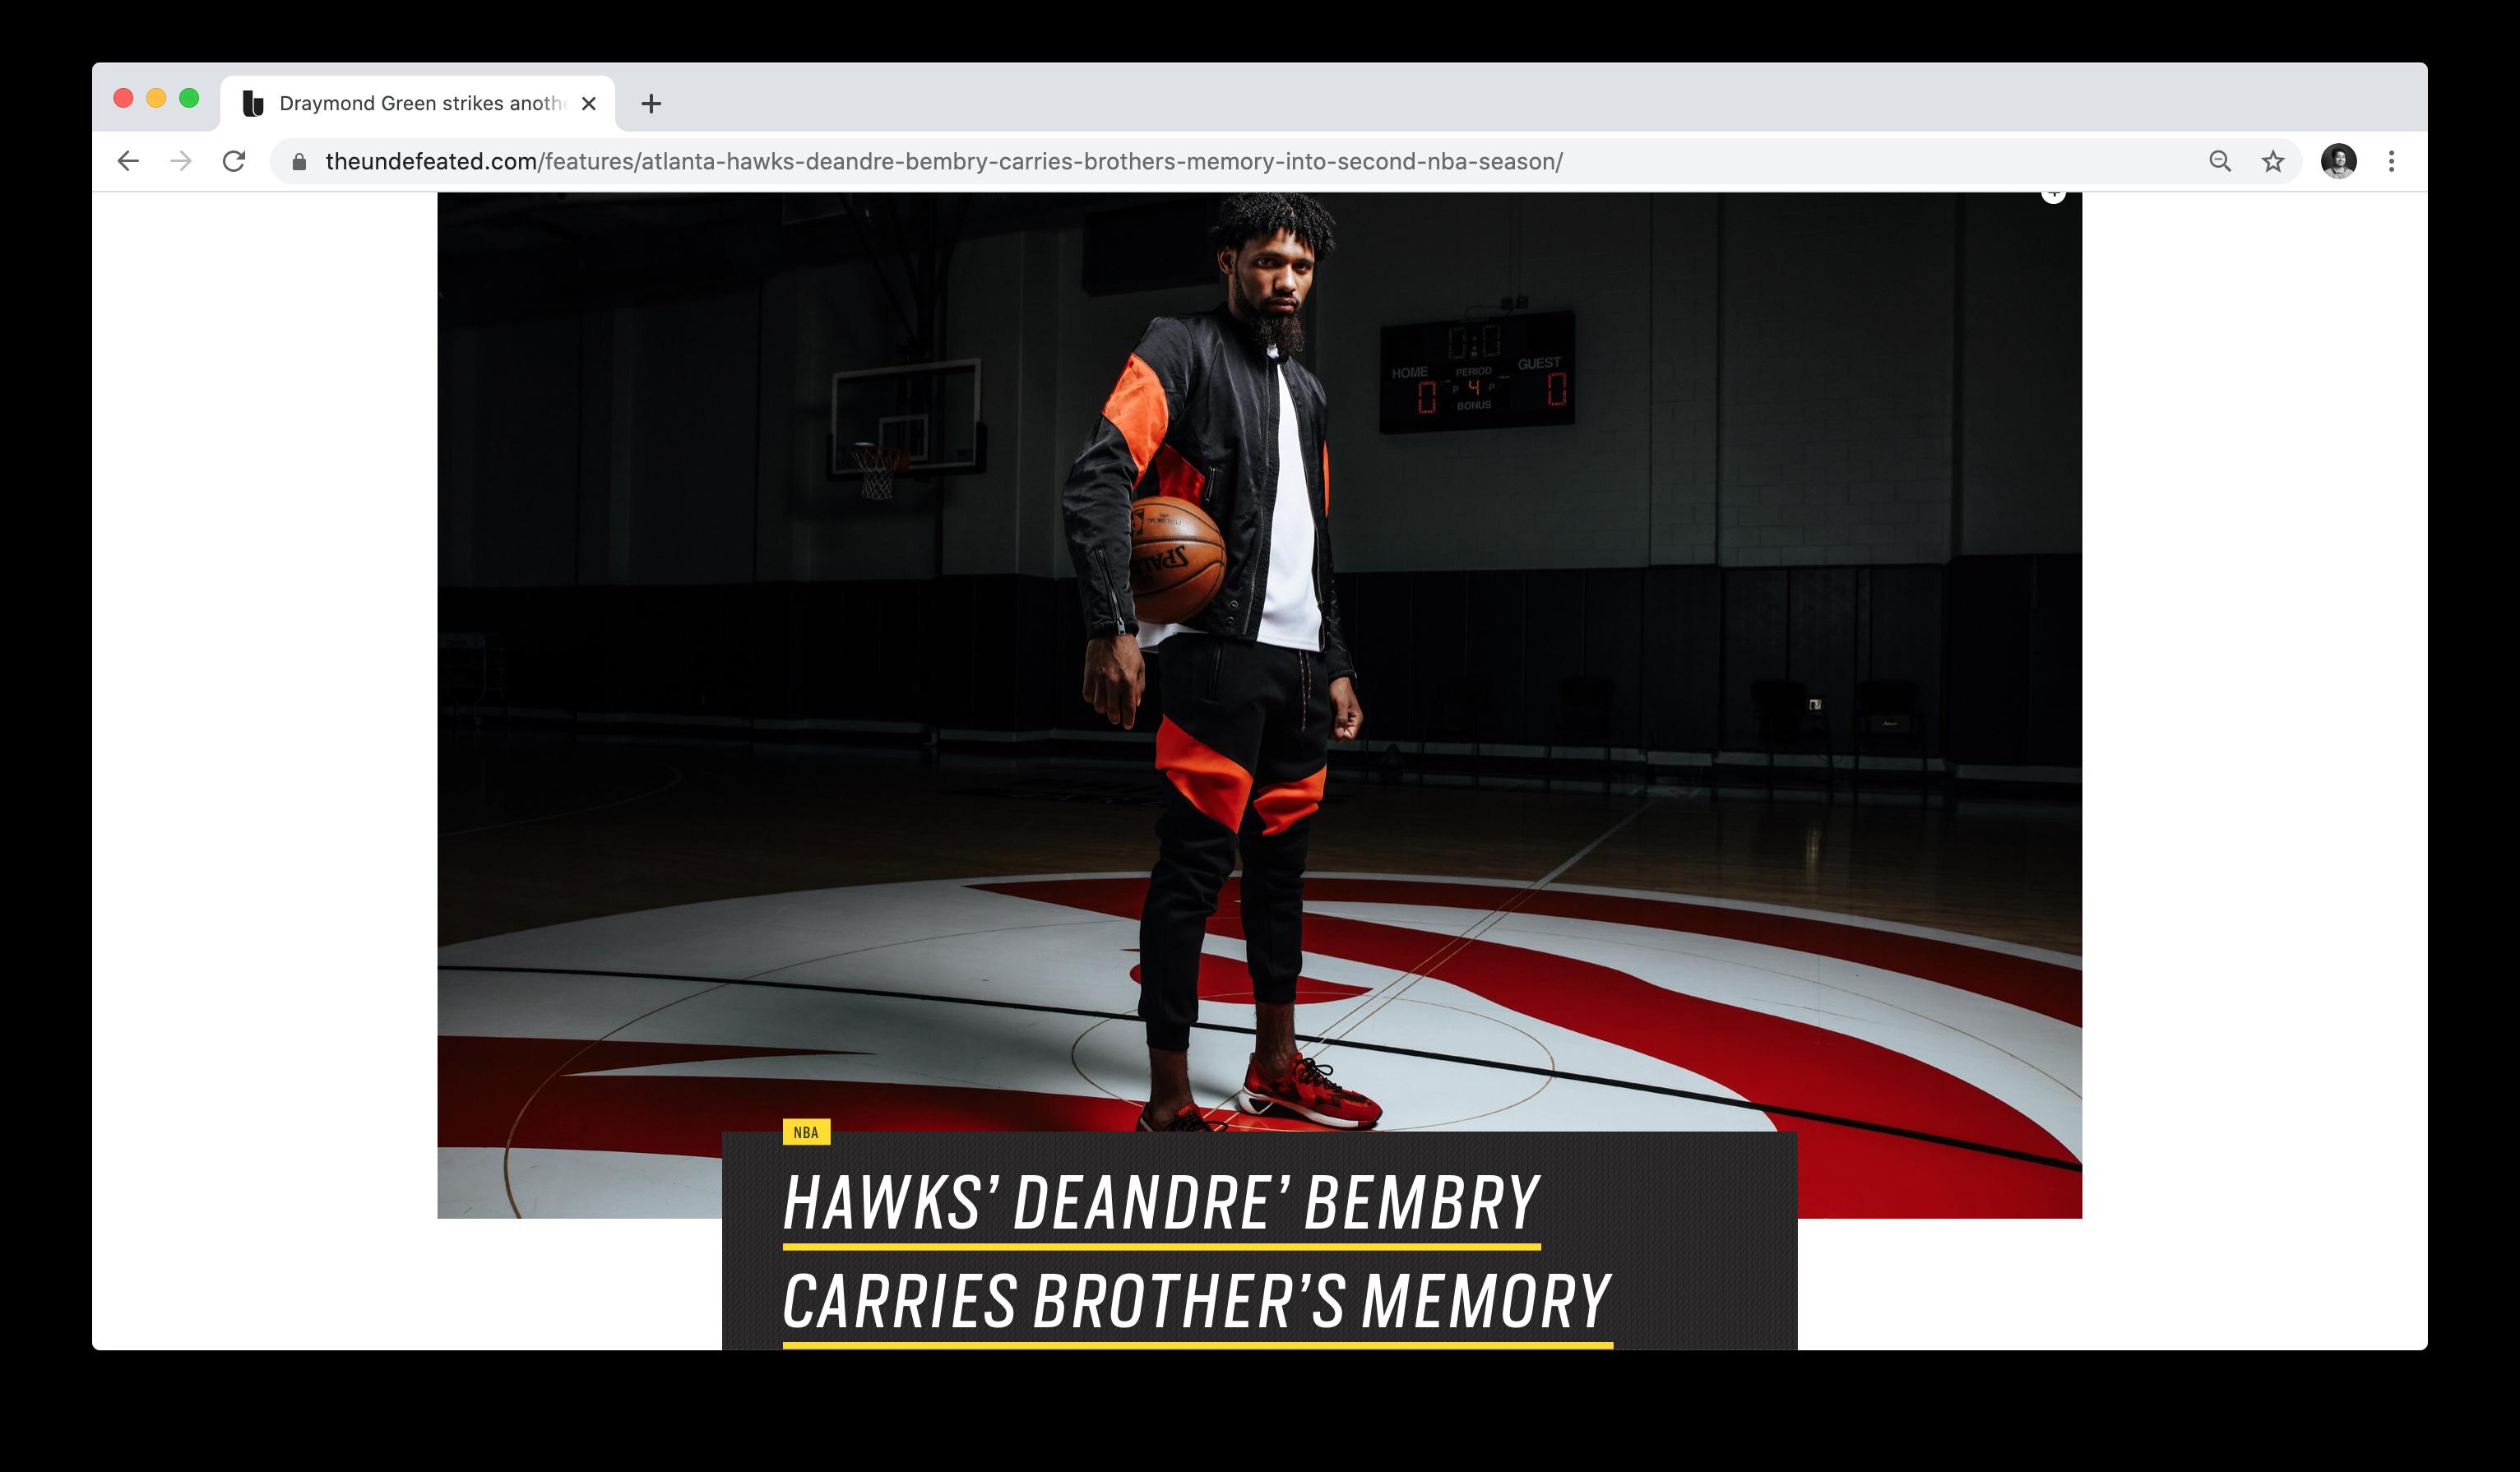 Matt Odom photographs Deandre Bembry for ESPN's The Undefeated